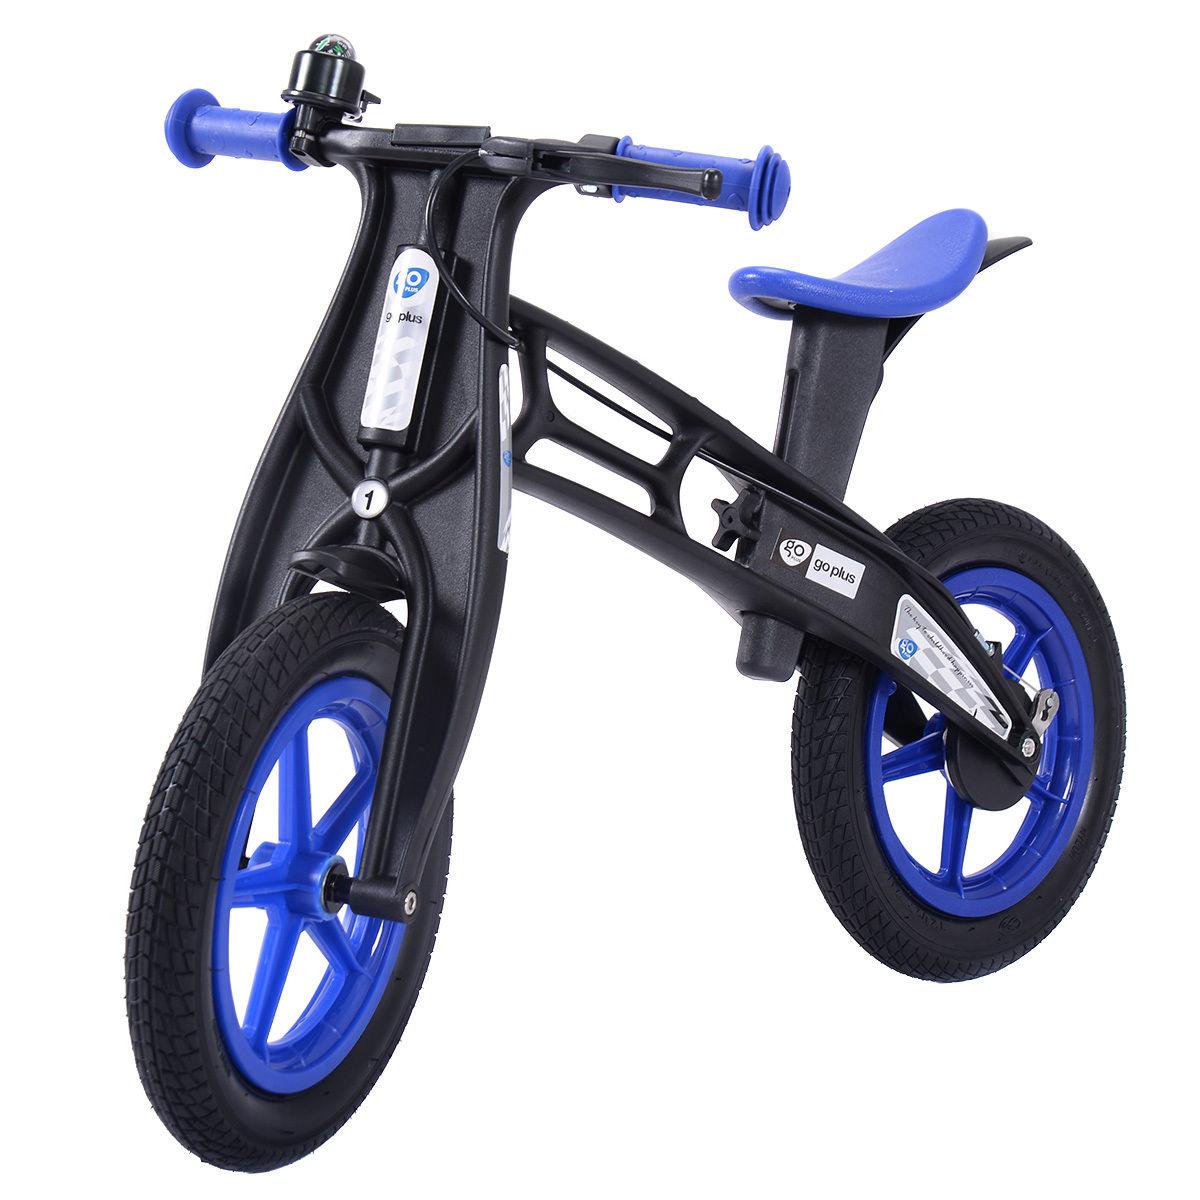 Balance bike Classic Kids No-Pedal Learn To Ride Pre Bike w/Brake & Bell Blue